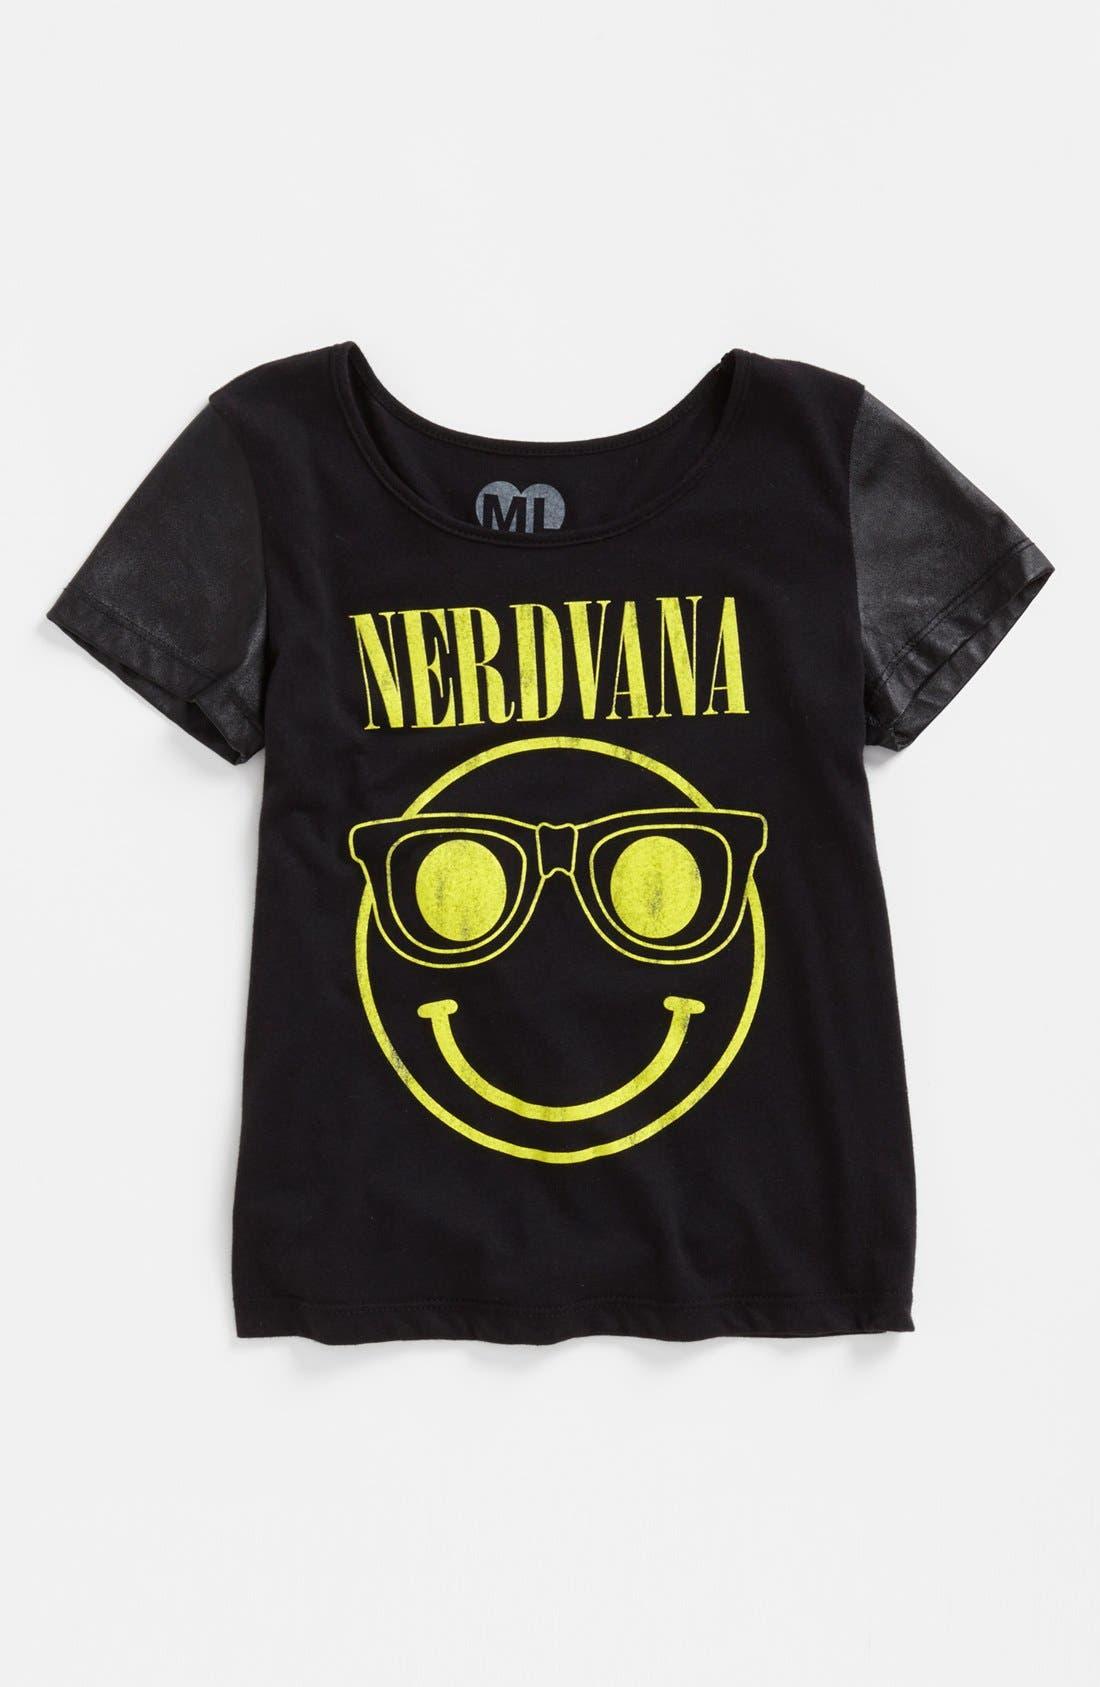 Alternate Image 1 Selected - Modern Lux 'Nerdvana' Graphic Tee (Big Girls)